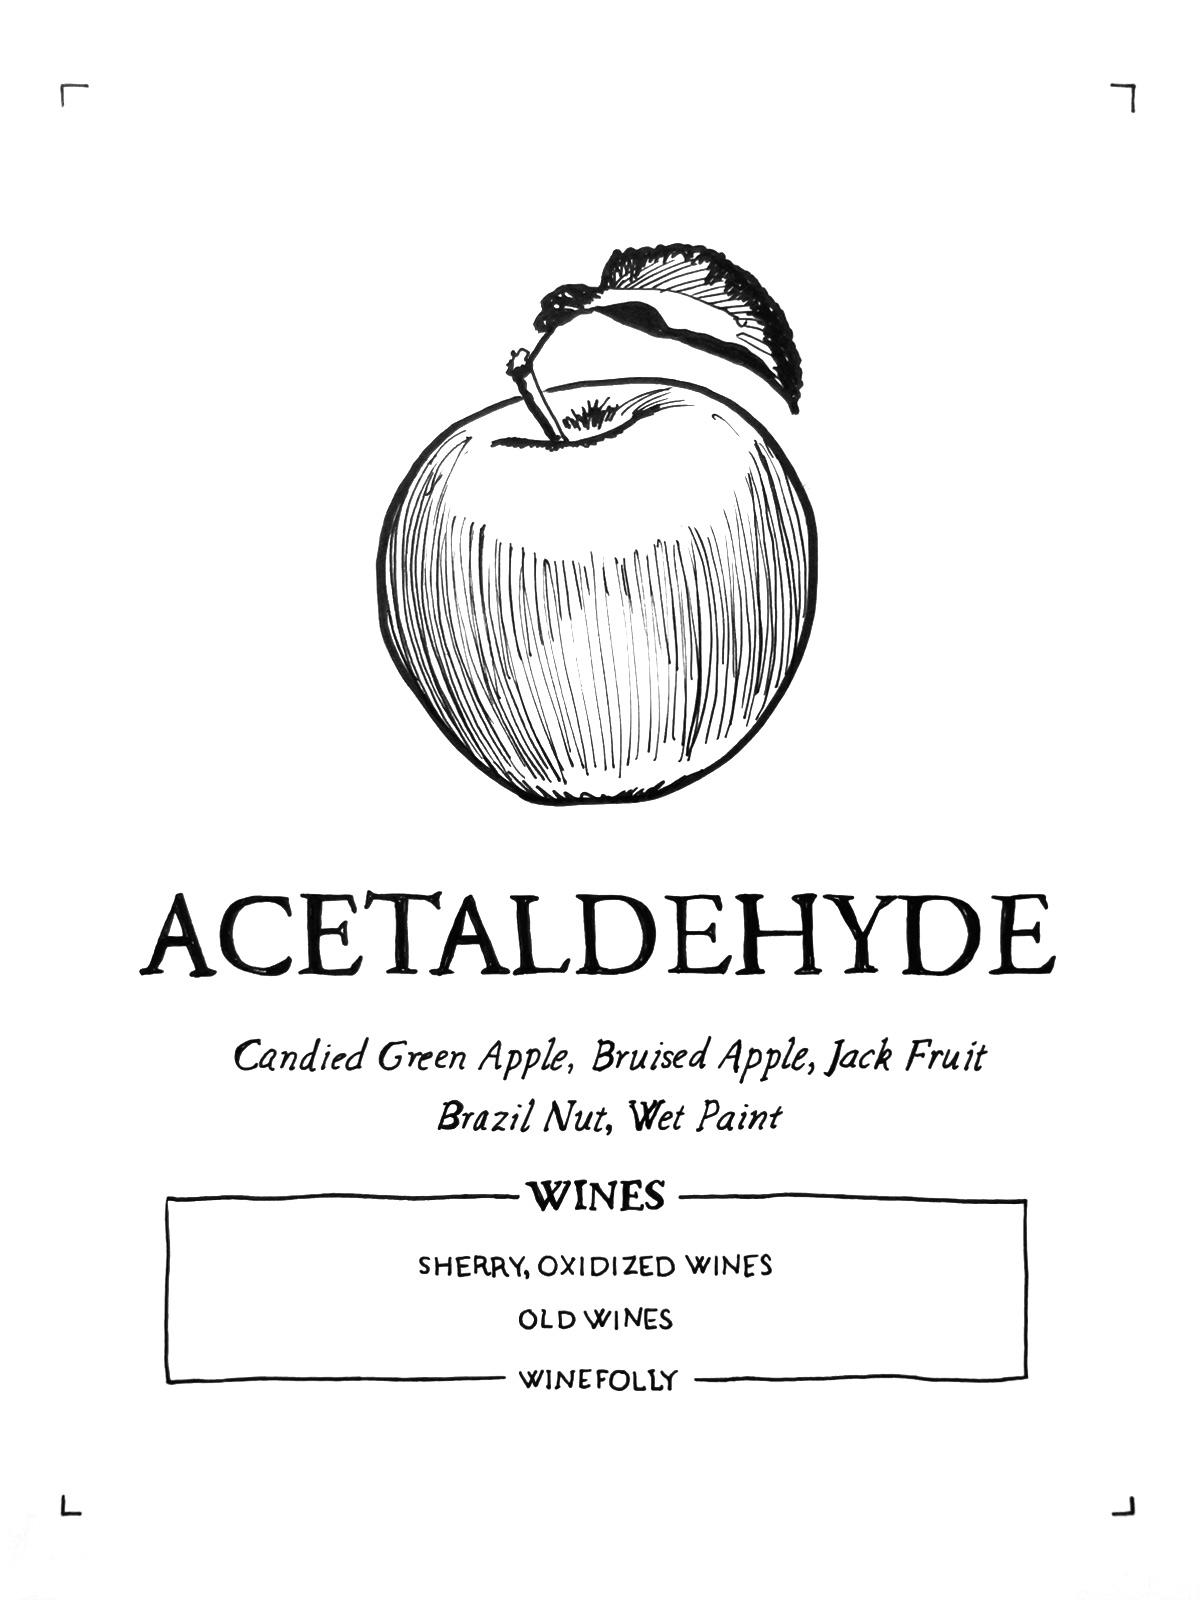 acetaldehyde-in-wine-folly-illustration